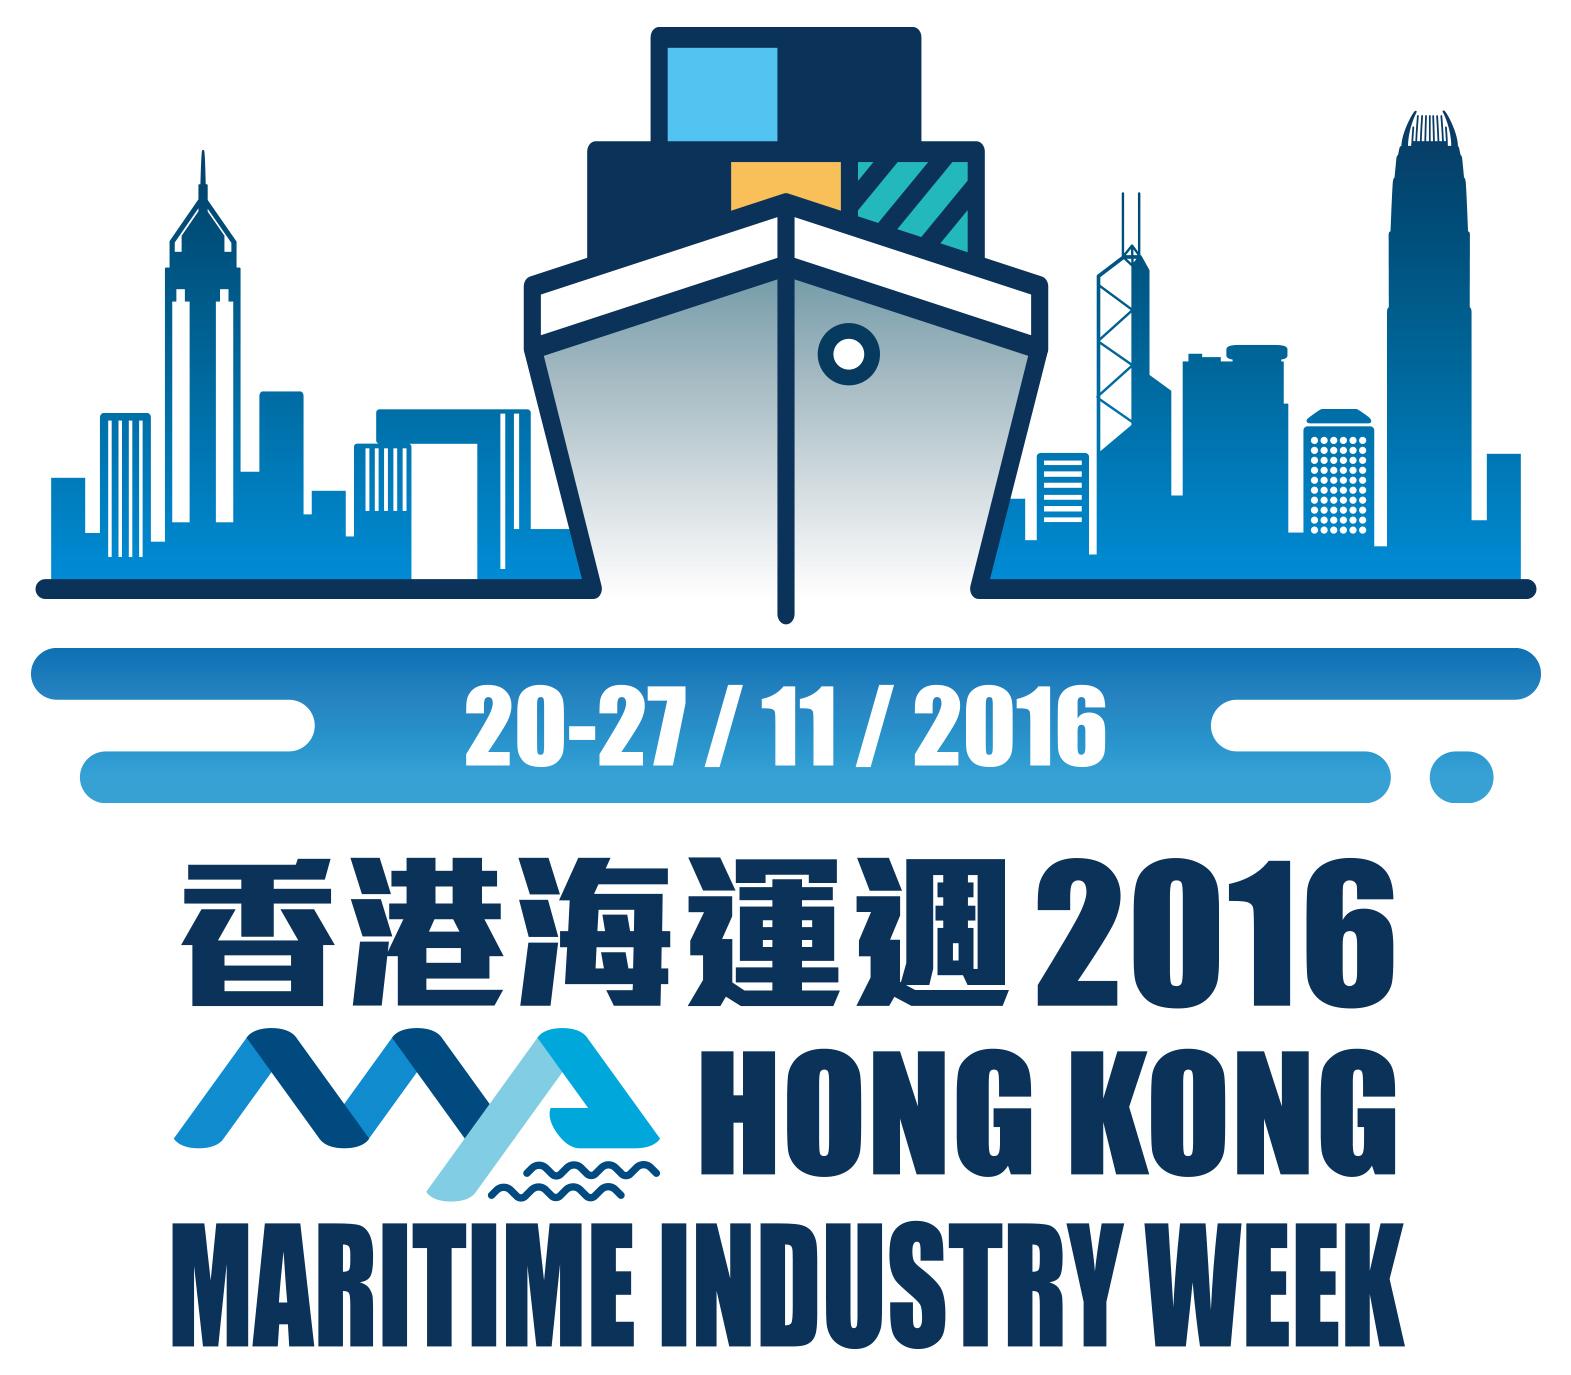 Hong Kong Maritime Industry Week 2016